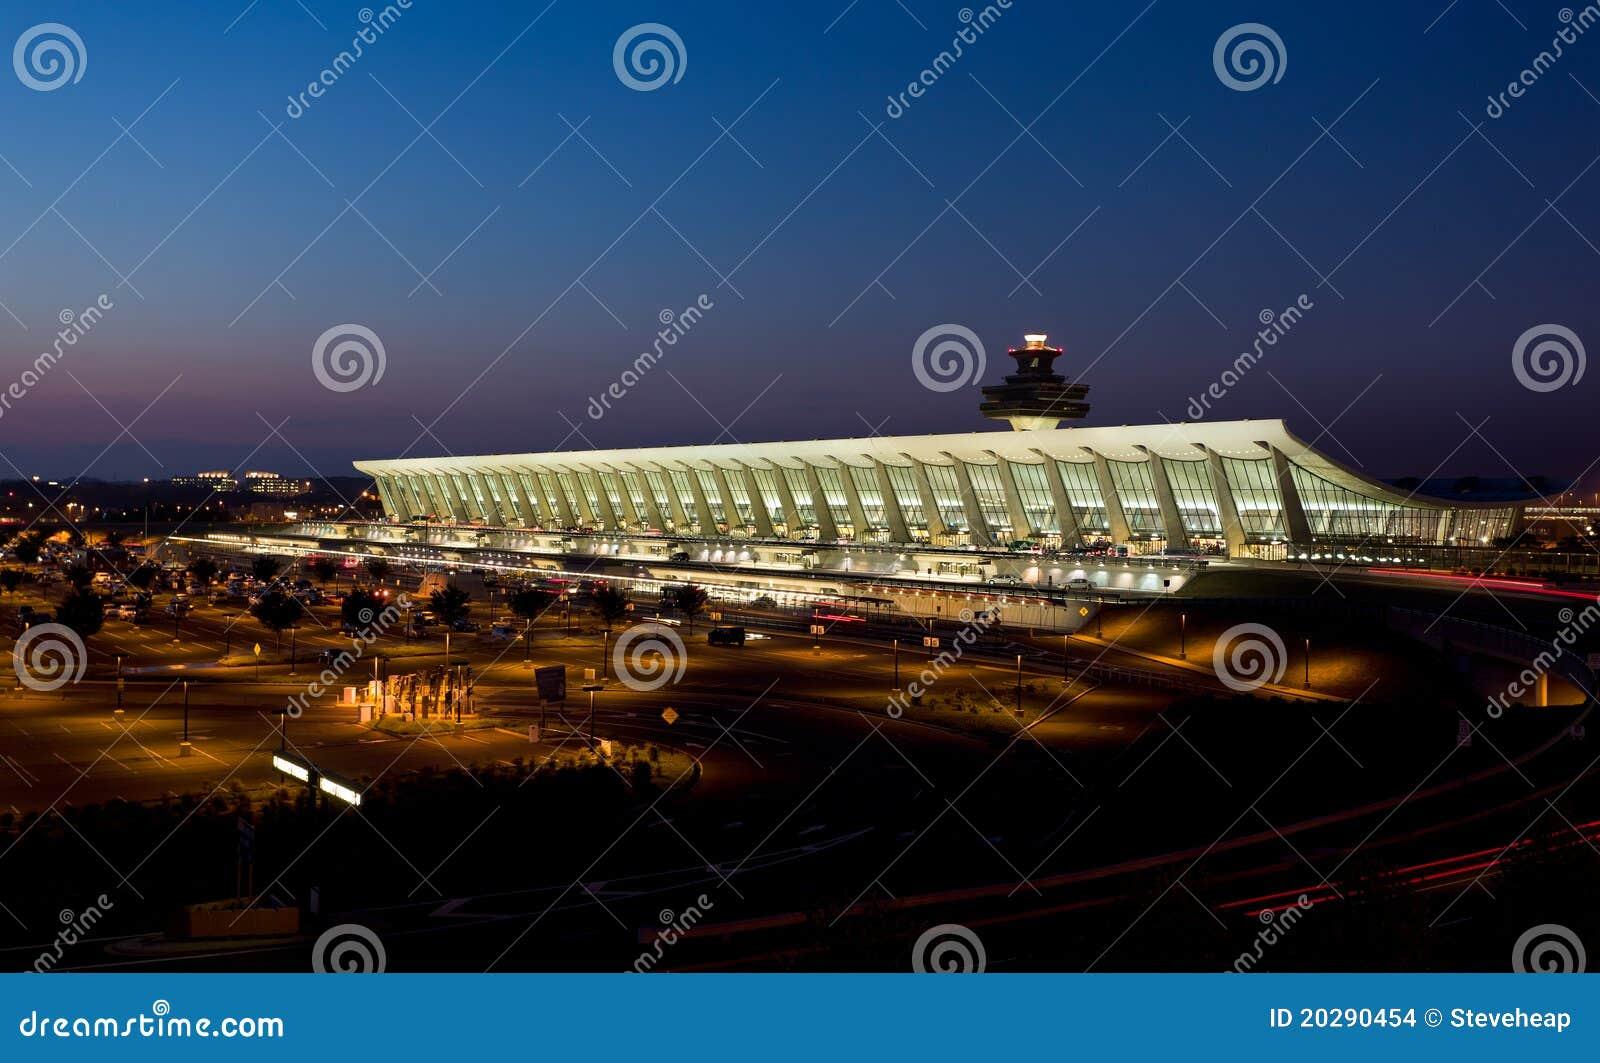 Aeroporto Washington : Aeroporto de dulles no alvorecer perto do washington dc